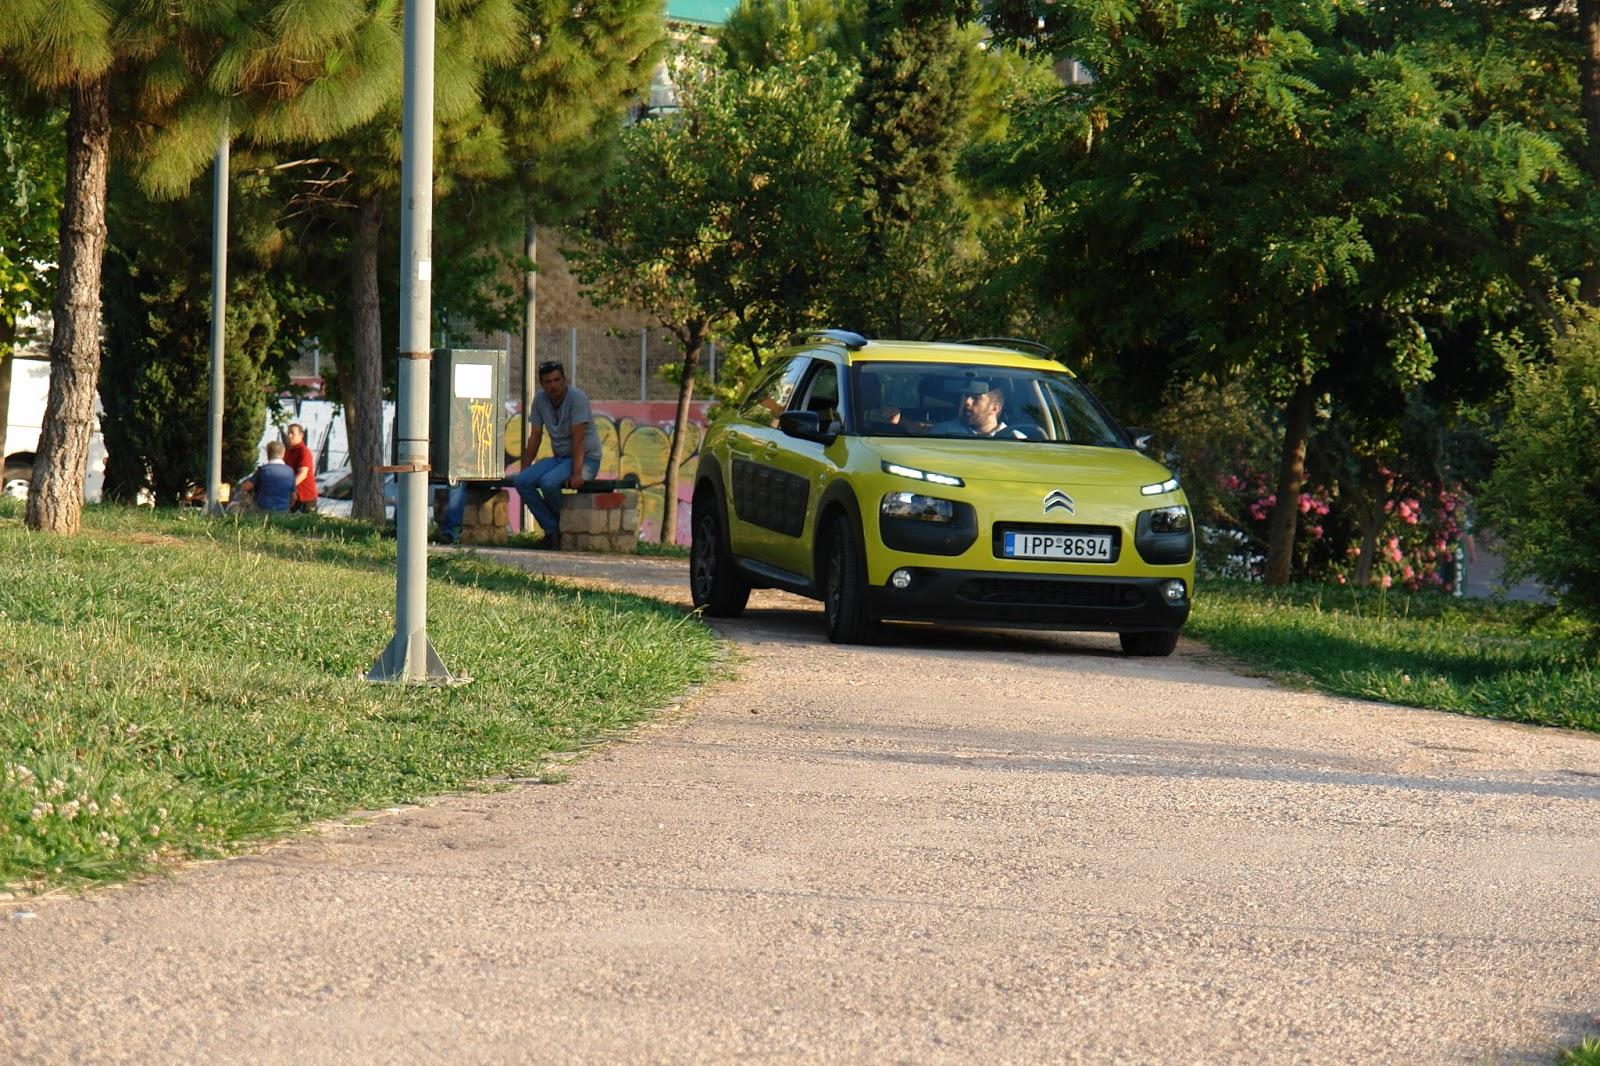 citcactustopspeed Τα 10 καλύτερα αυτοκίνητα για νέες μαμάδες topspeed.gr, zblog, μαμάδες, μητέρες, μωρά